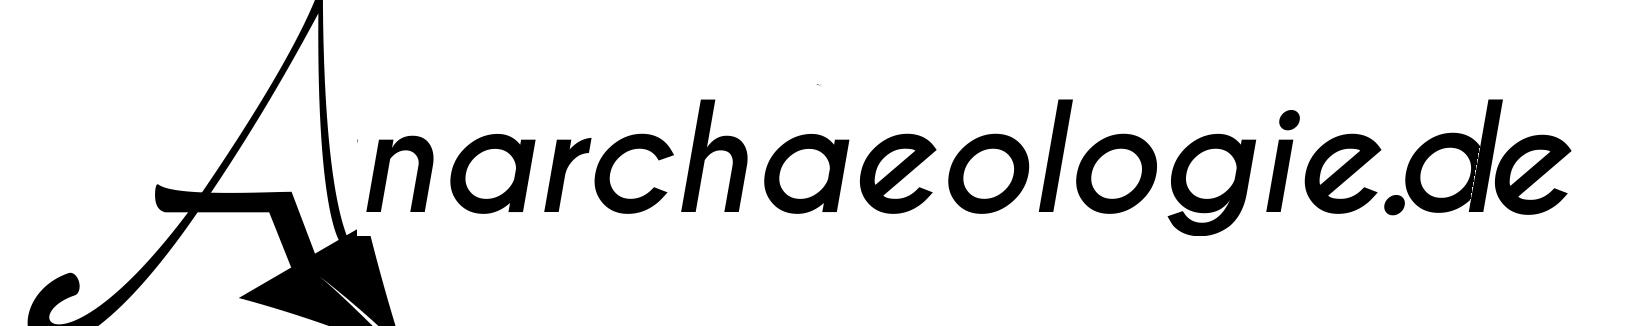 cropped-anarchaeologie1-Kopie-2.png